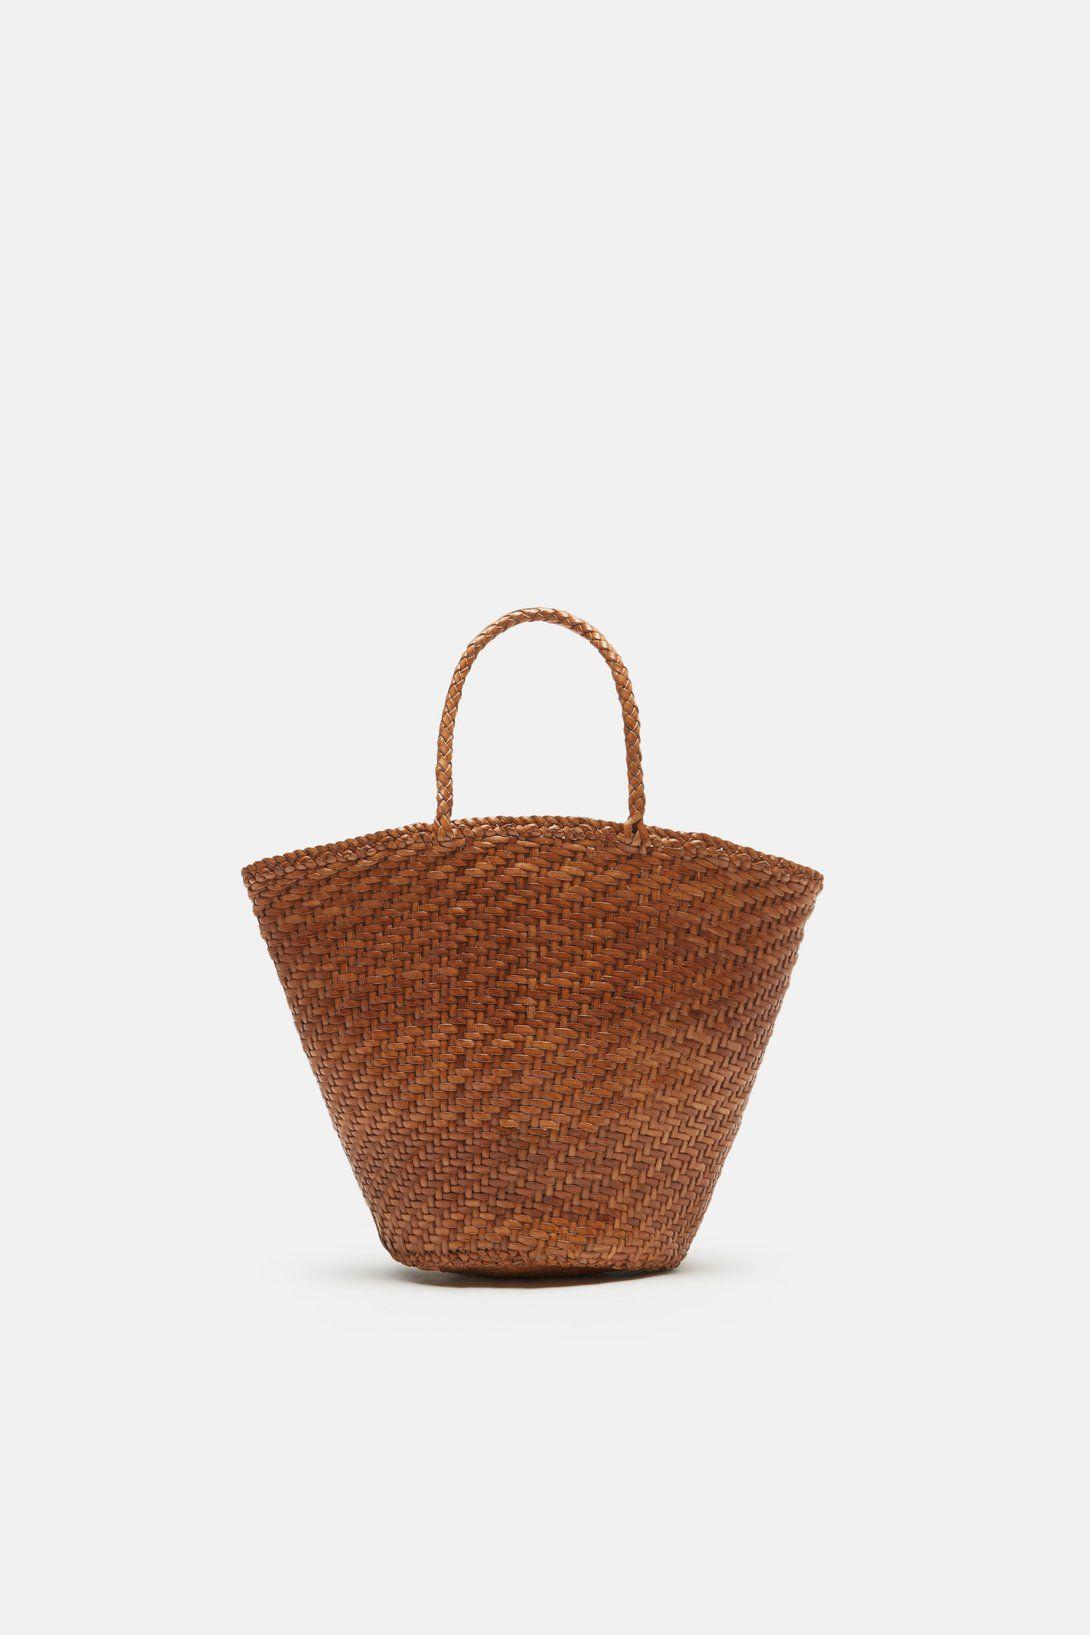 Myra Basket Bag Mini - Tan   Basket bag, Minis and Luxury sunglasses